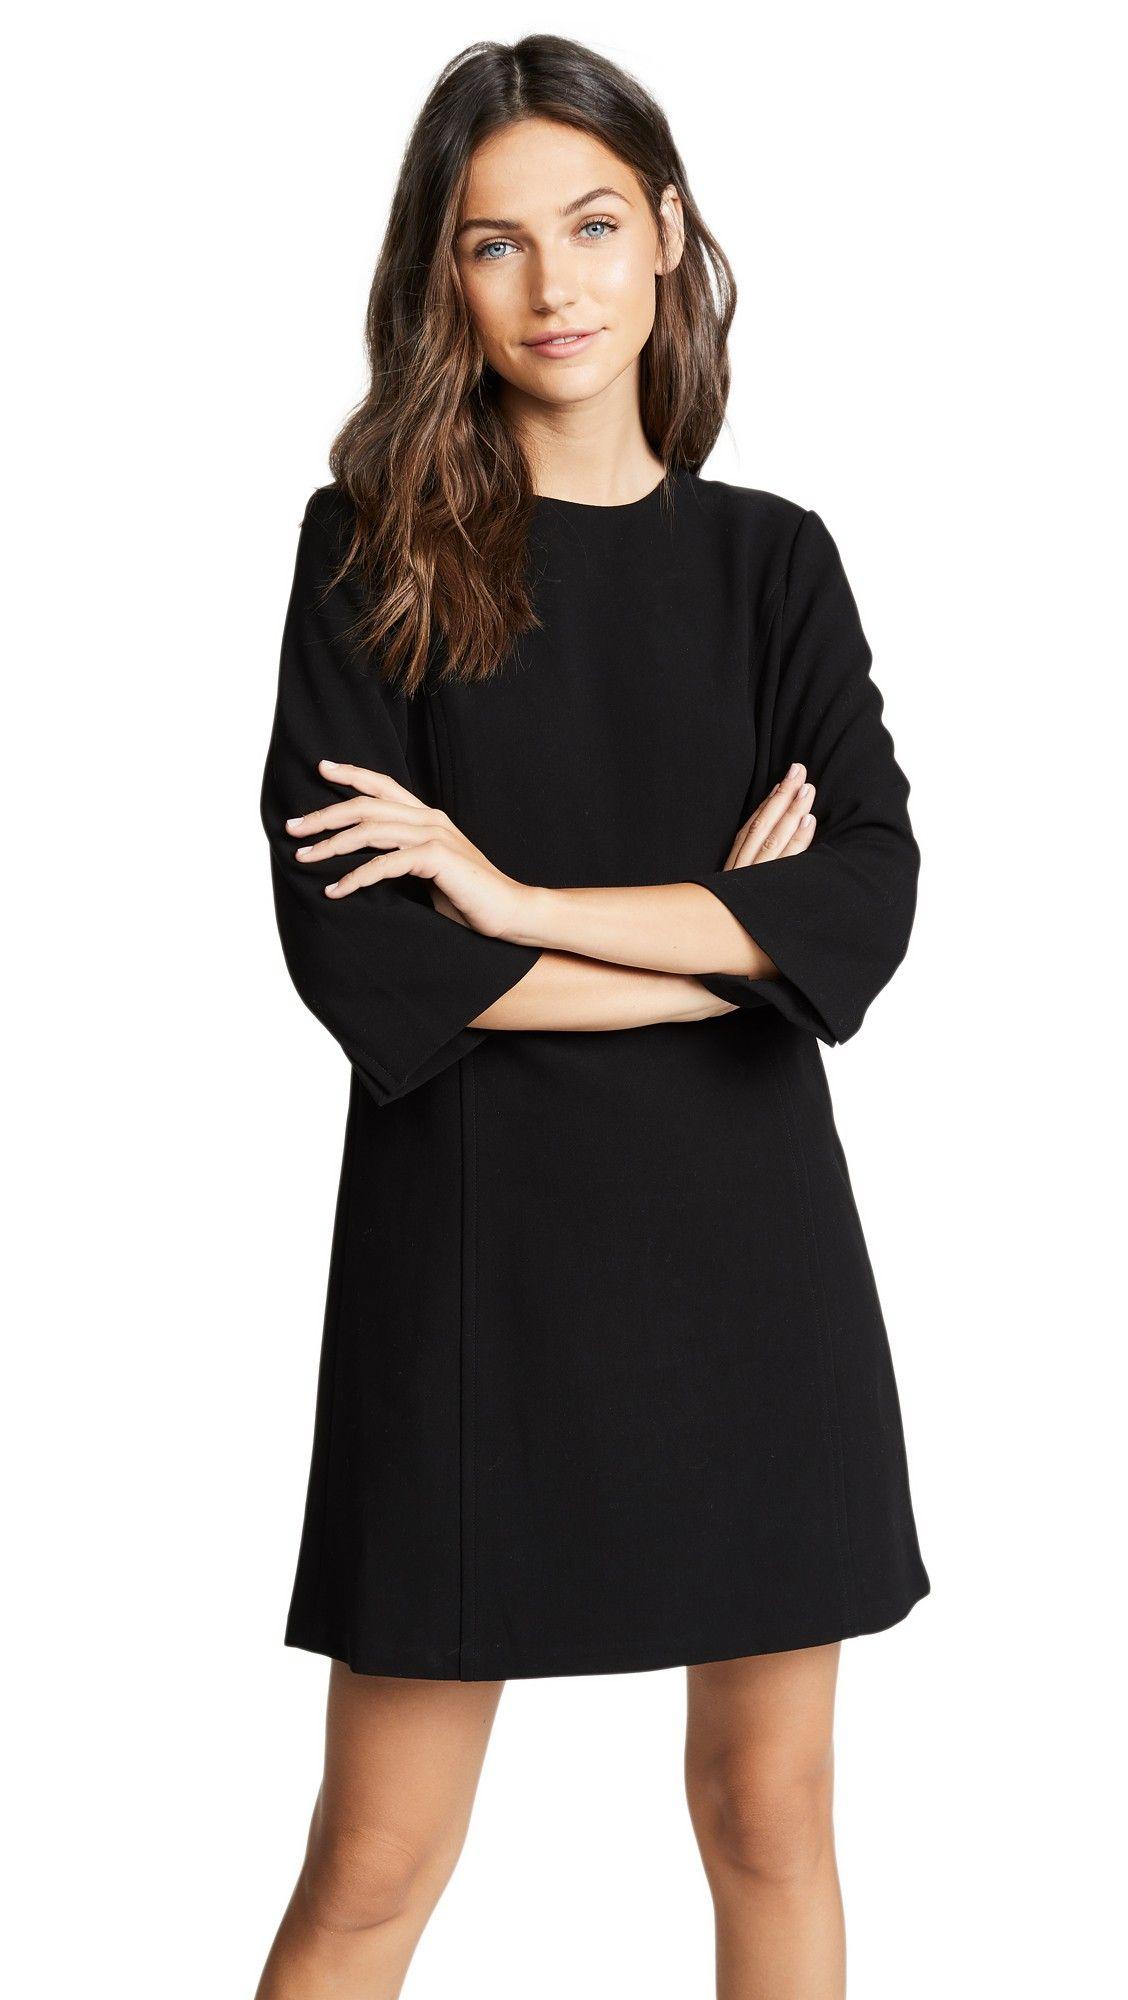 Alice Olivia Gem 3 4 Sleeve Shift Dress Day To Night Dresses Shift Dress Short Women Fashion [ 2000 x 1128 Pixel ]